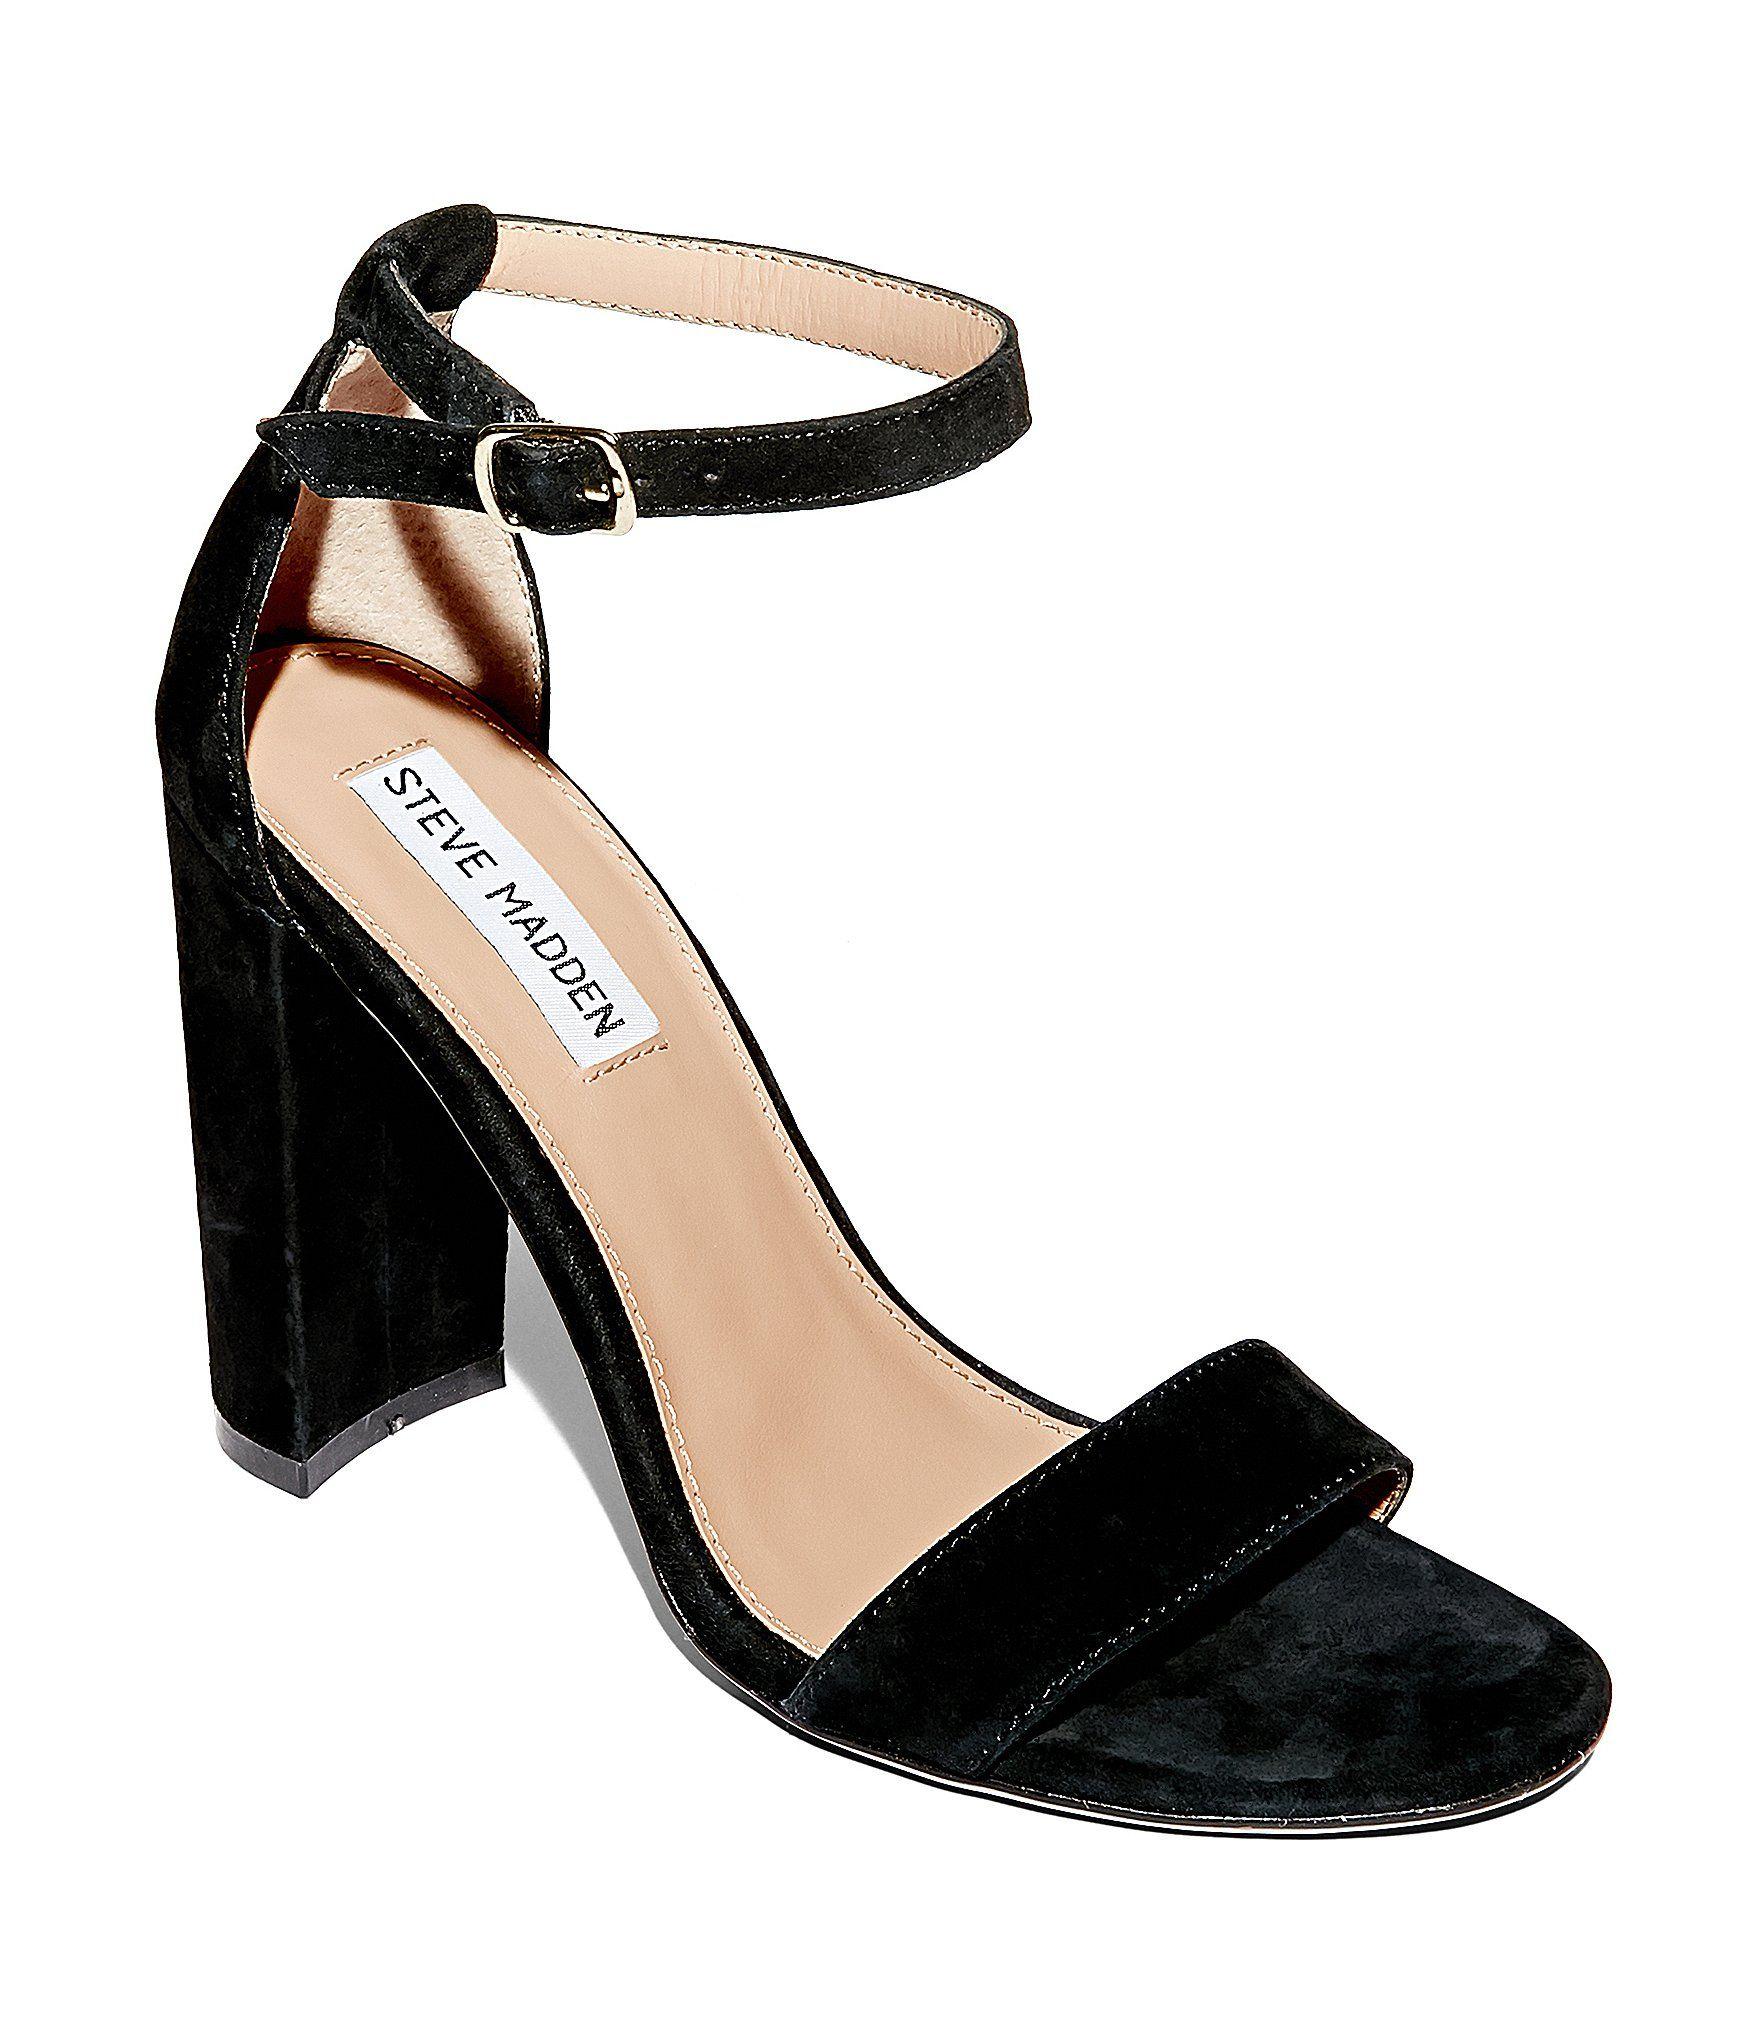 Steve Madden Carrson Suede Ankle Strap Block Heel Dress Sandals   Dillards